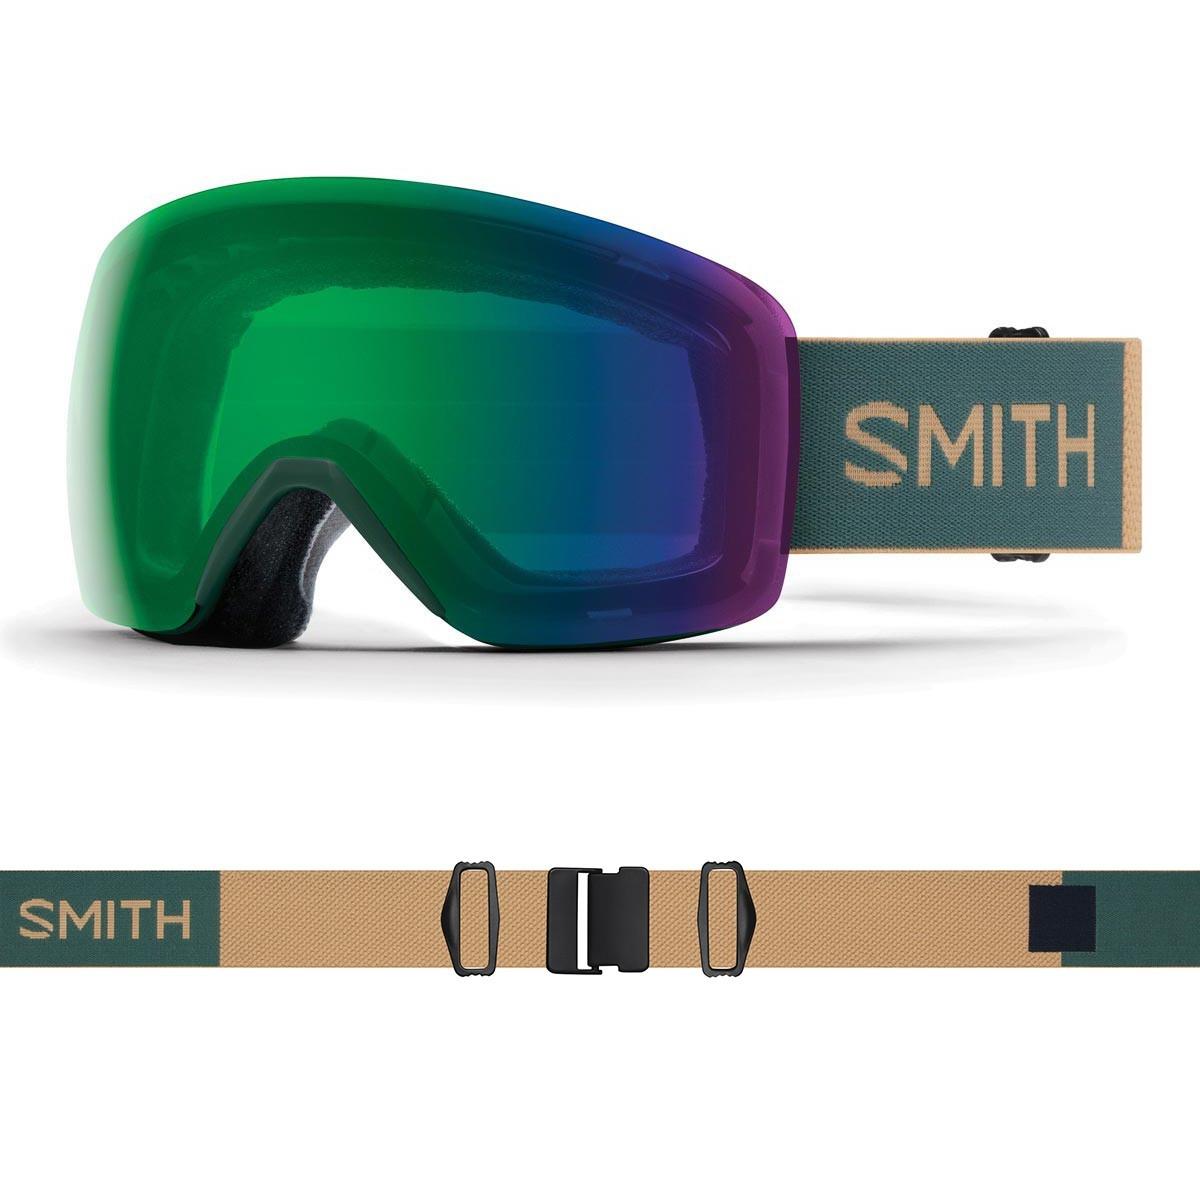 SMITH SKYLINE spruce safari   S2 CHROMAPOP Everyday Green Mirror - Изображение - AQUAMATRIX